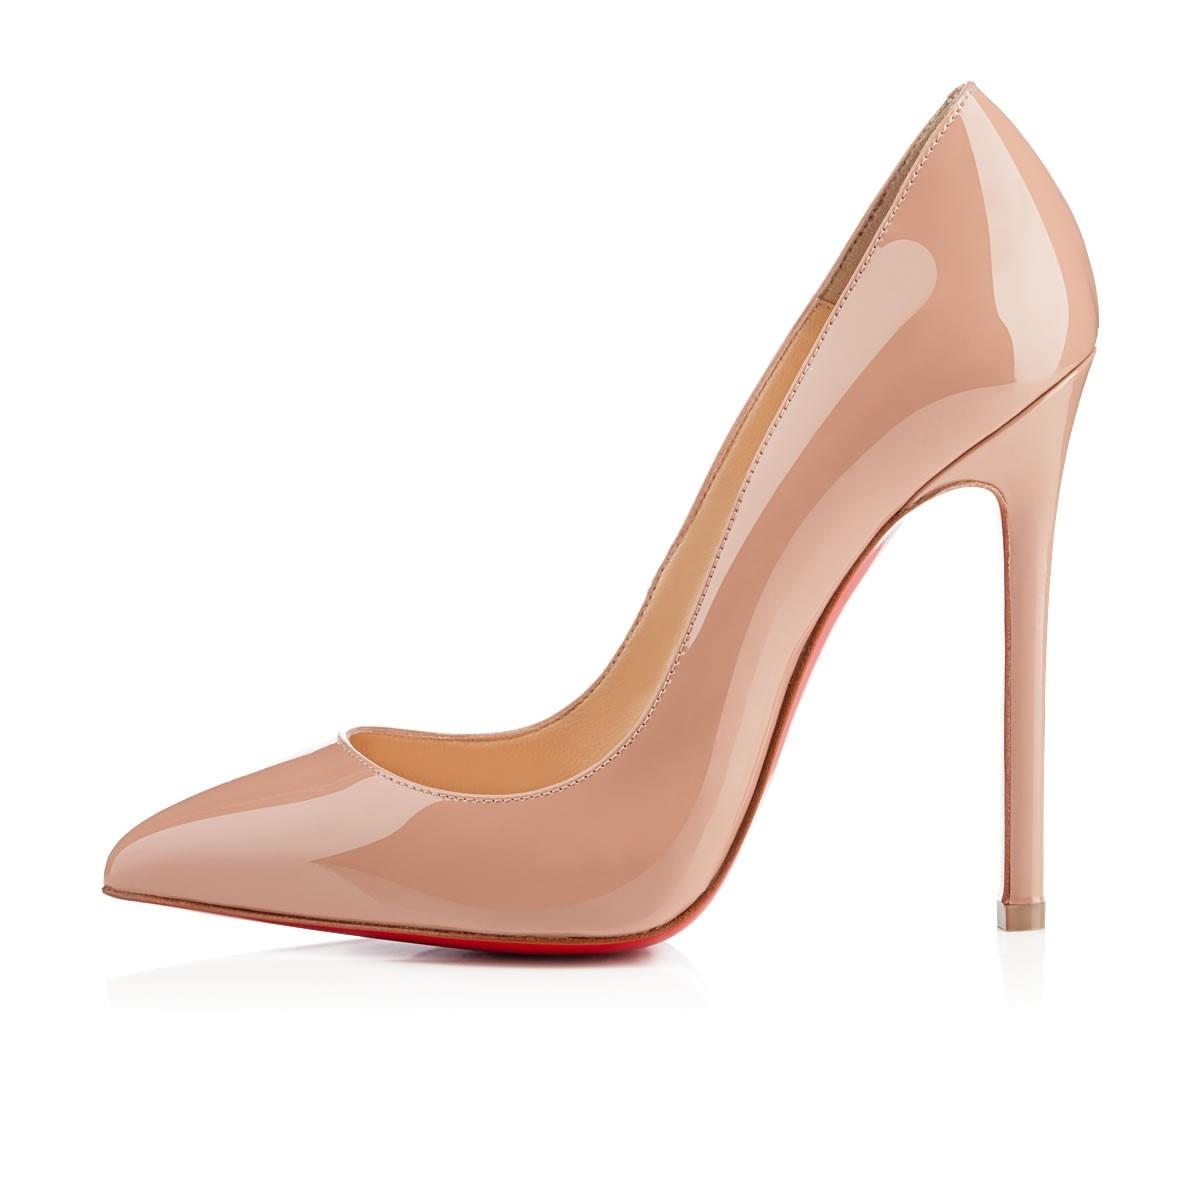 1:1 copy Christian Louboutin CL red paint 10cm heels sandals shoes [shoes250] - $155.00 : Luxury